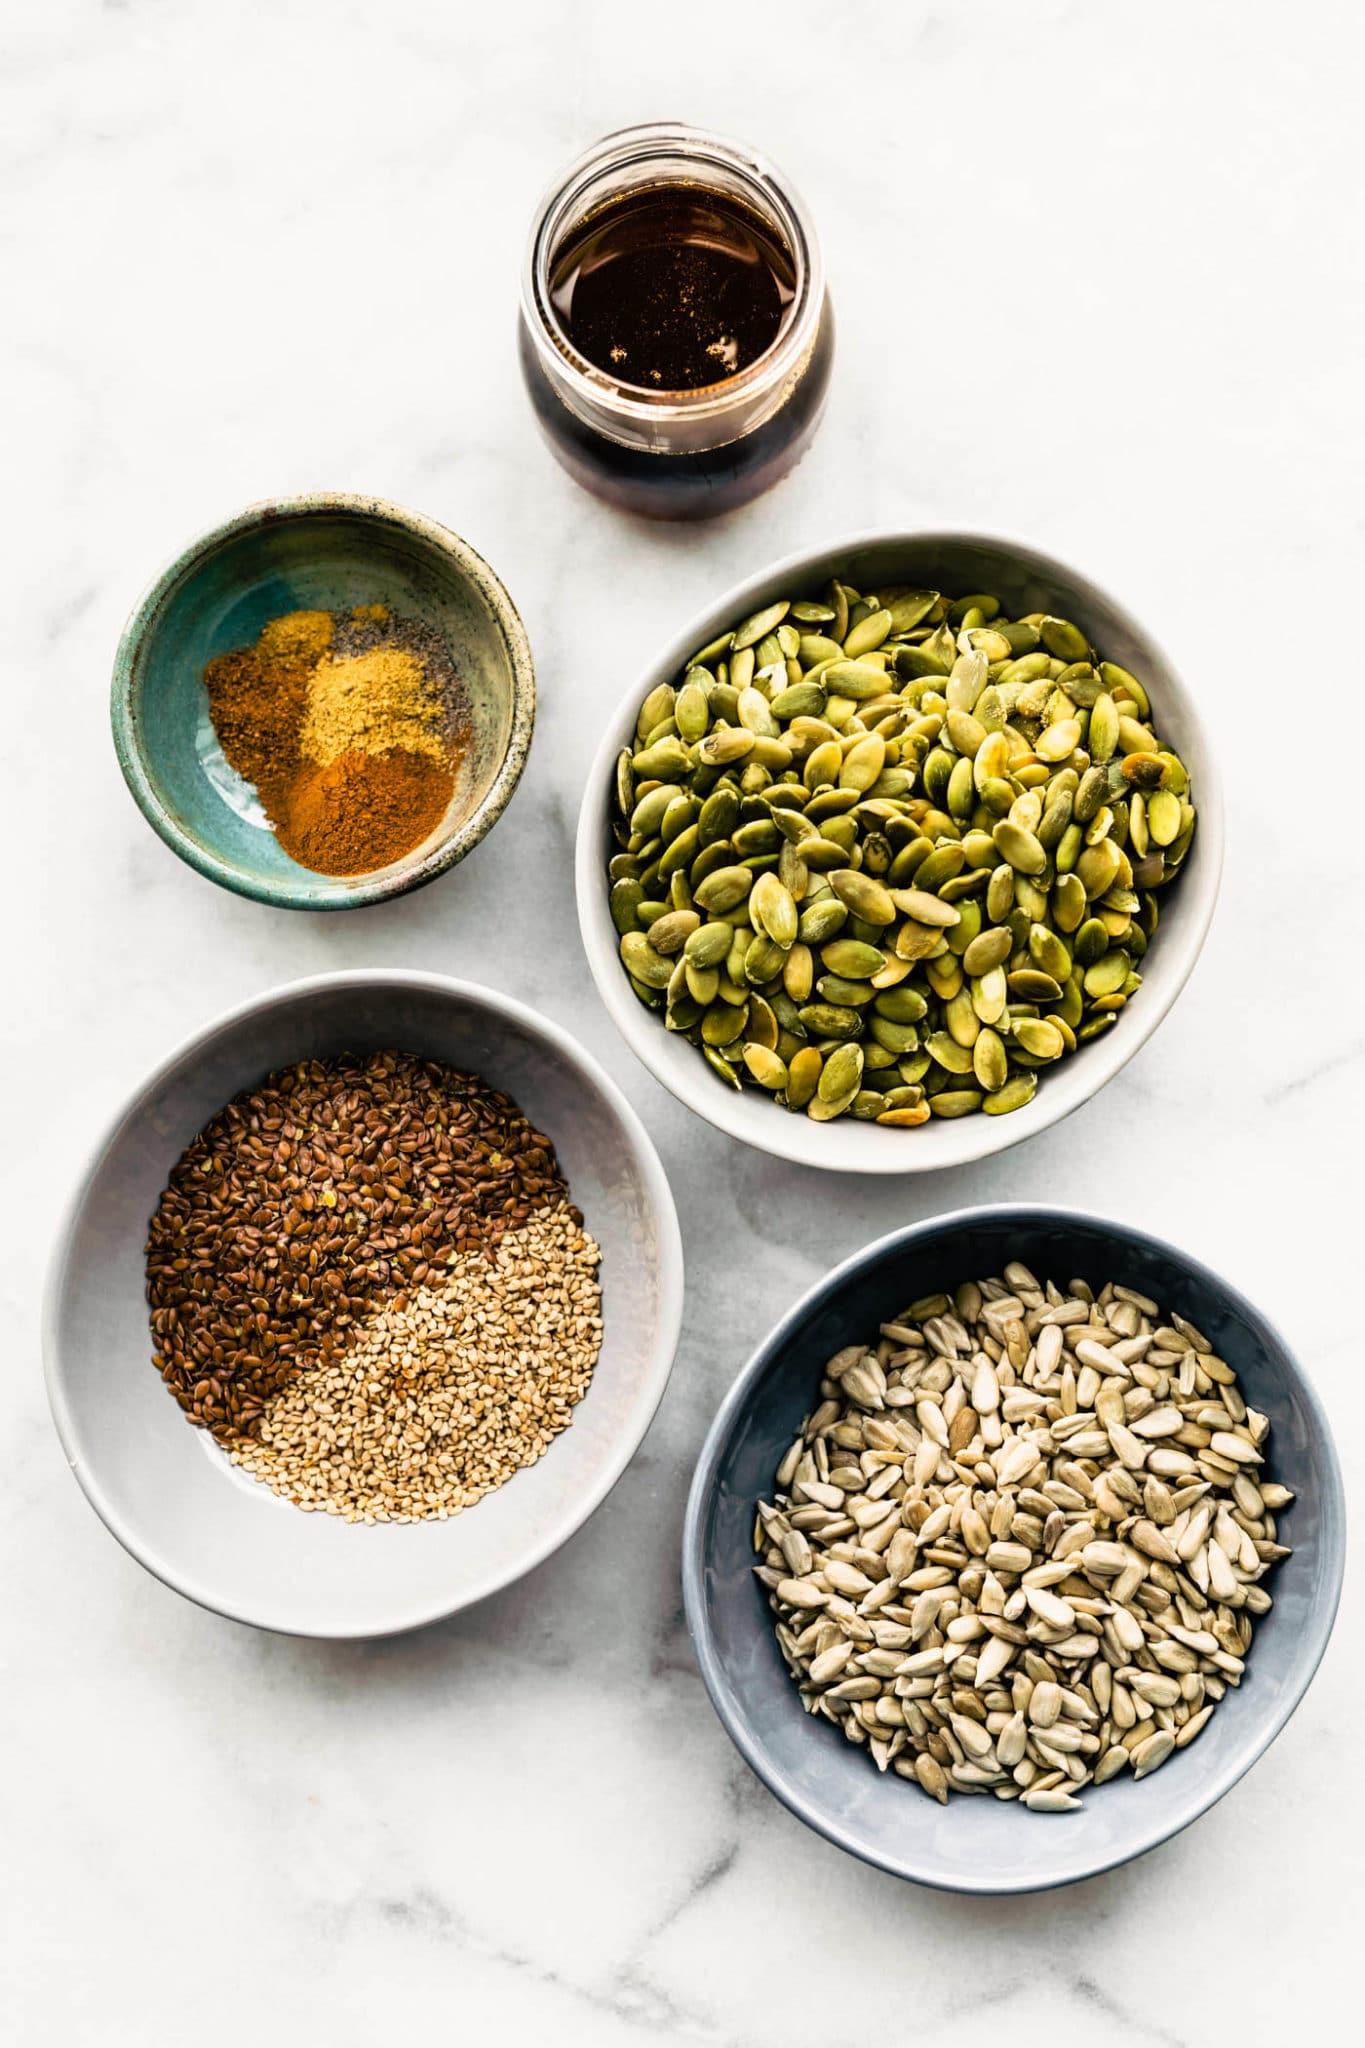 ingredients for pumpkin spice granola